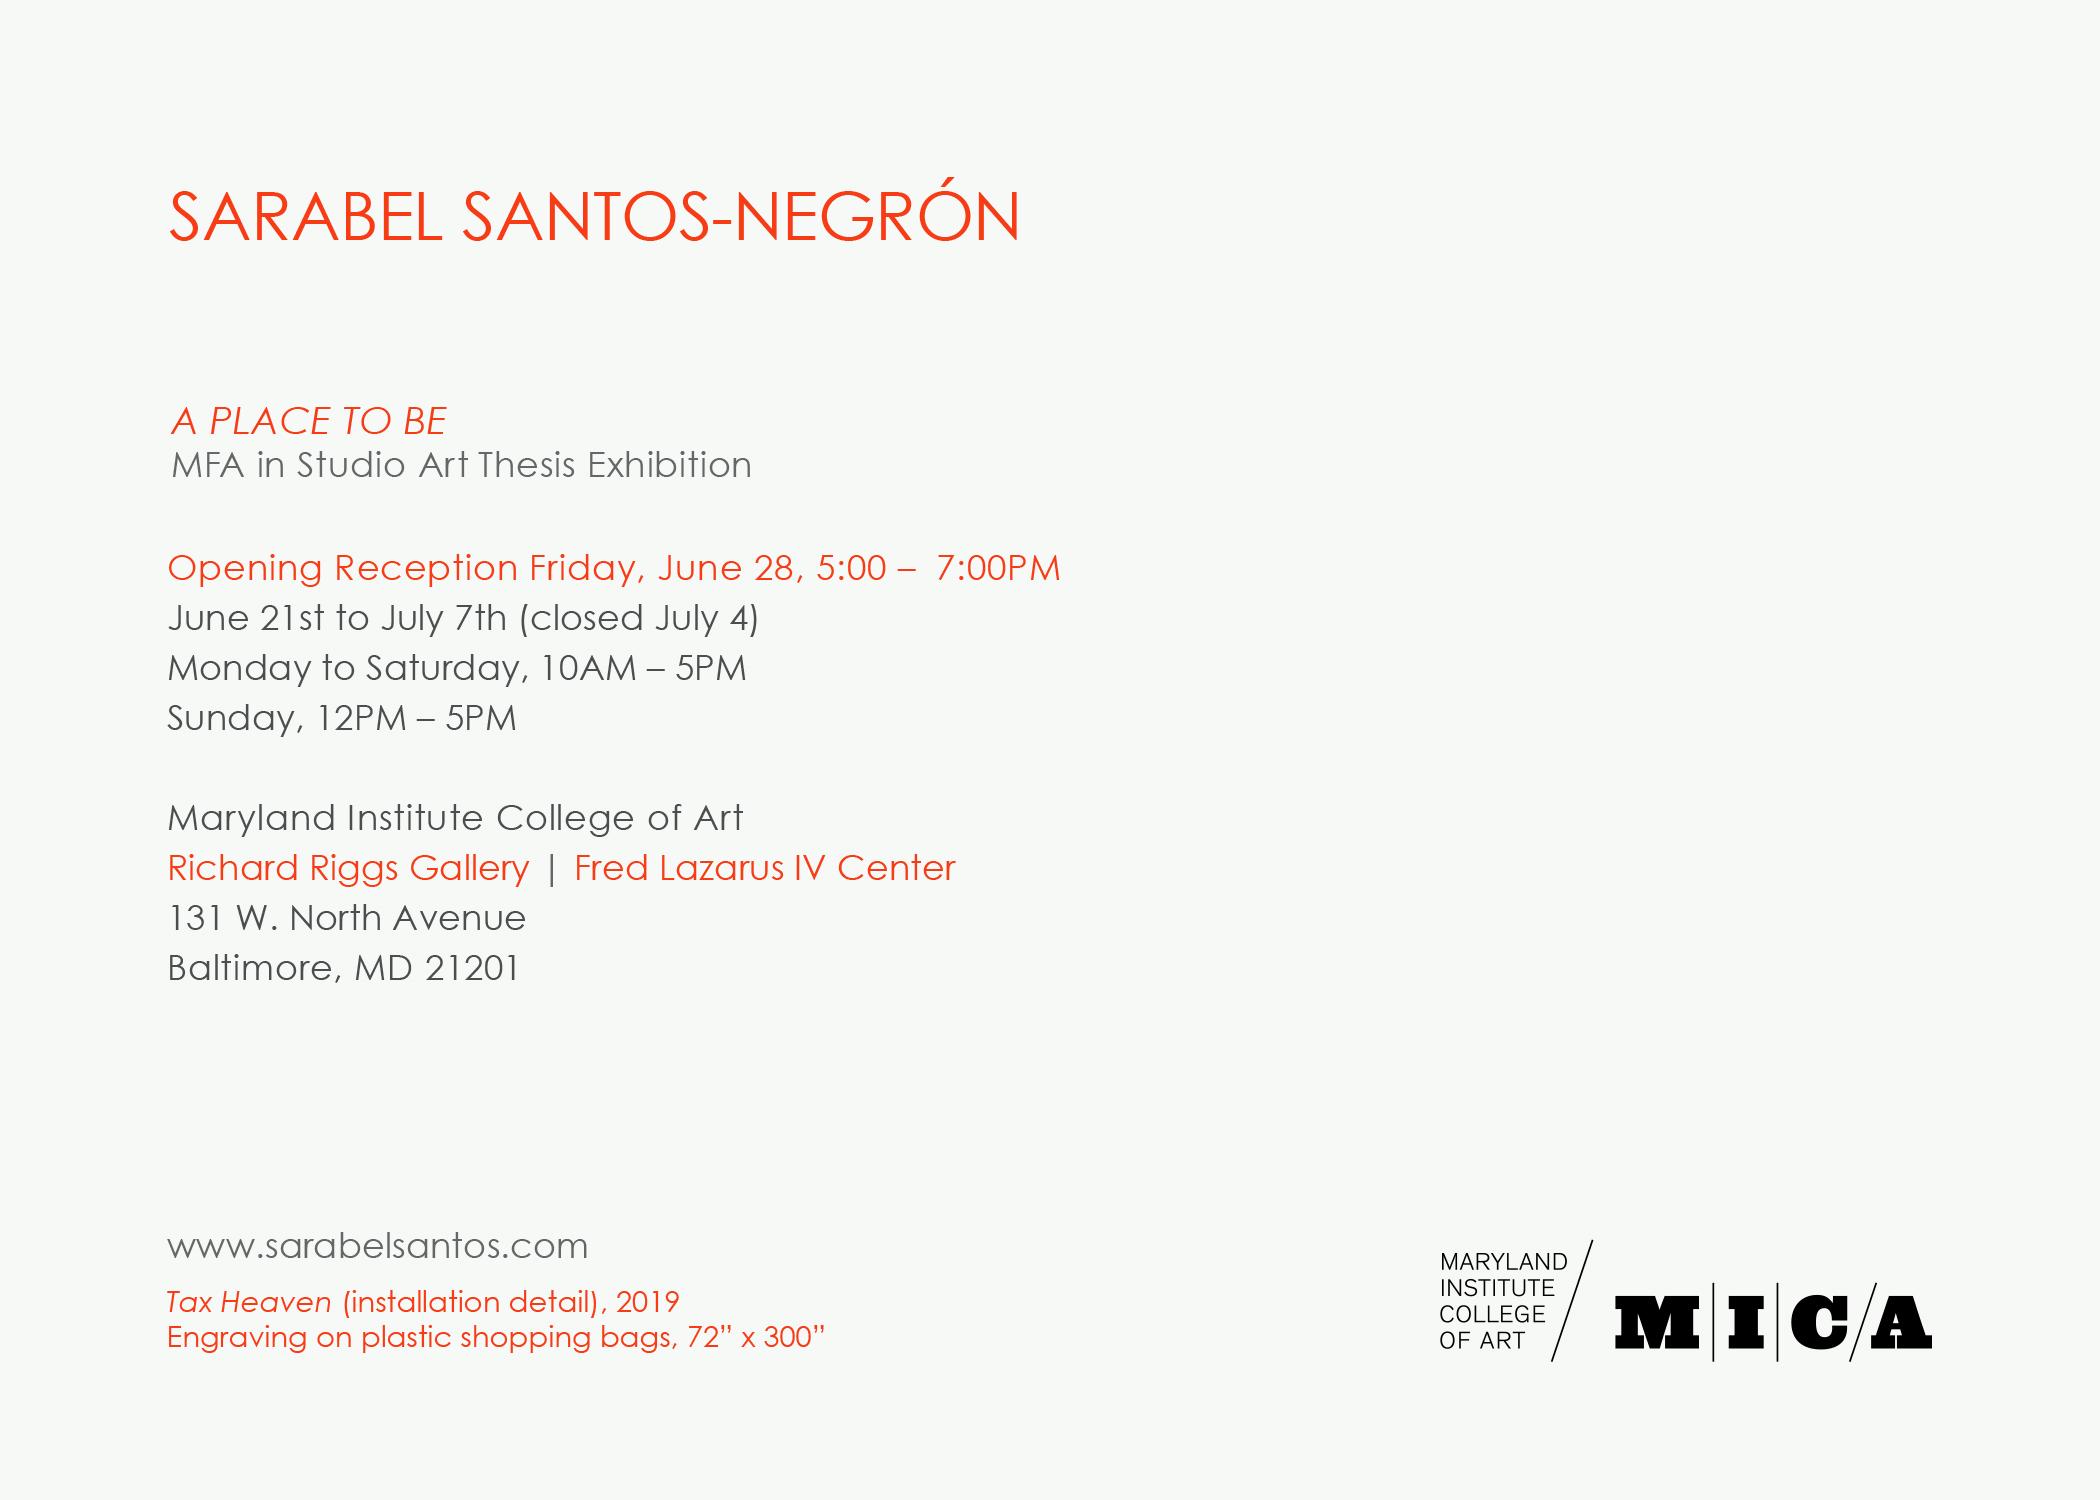 Postcard Promo SSN 3-2.jpg